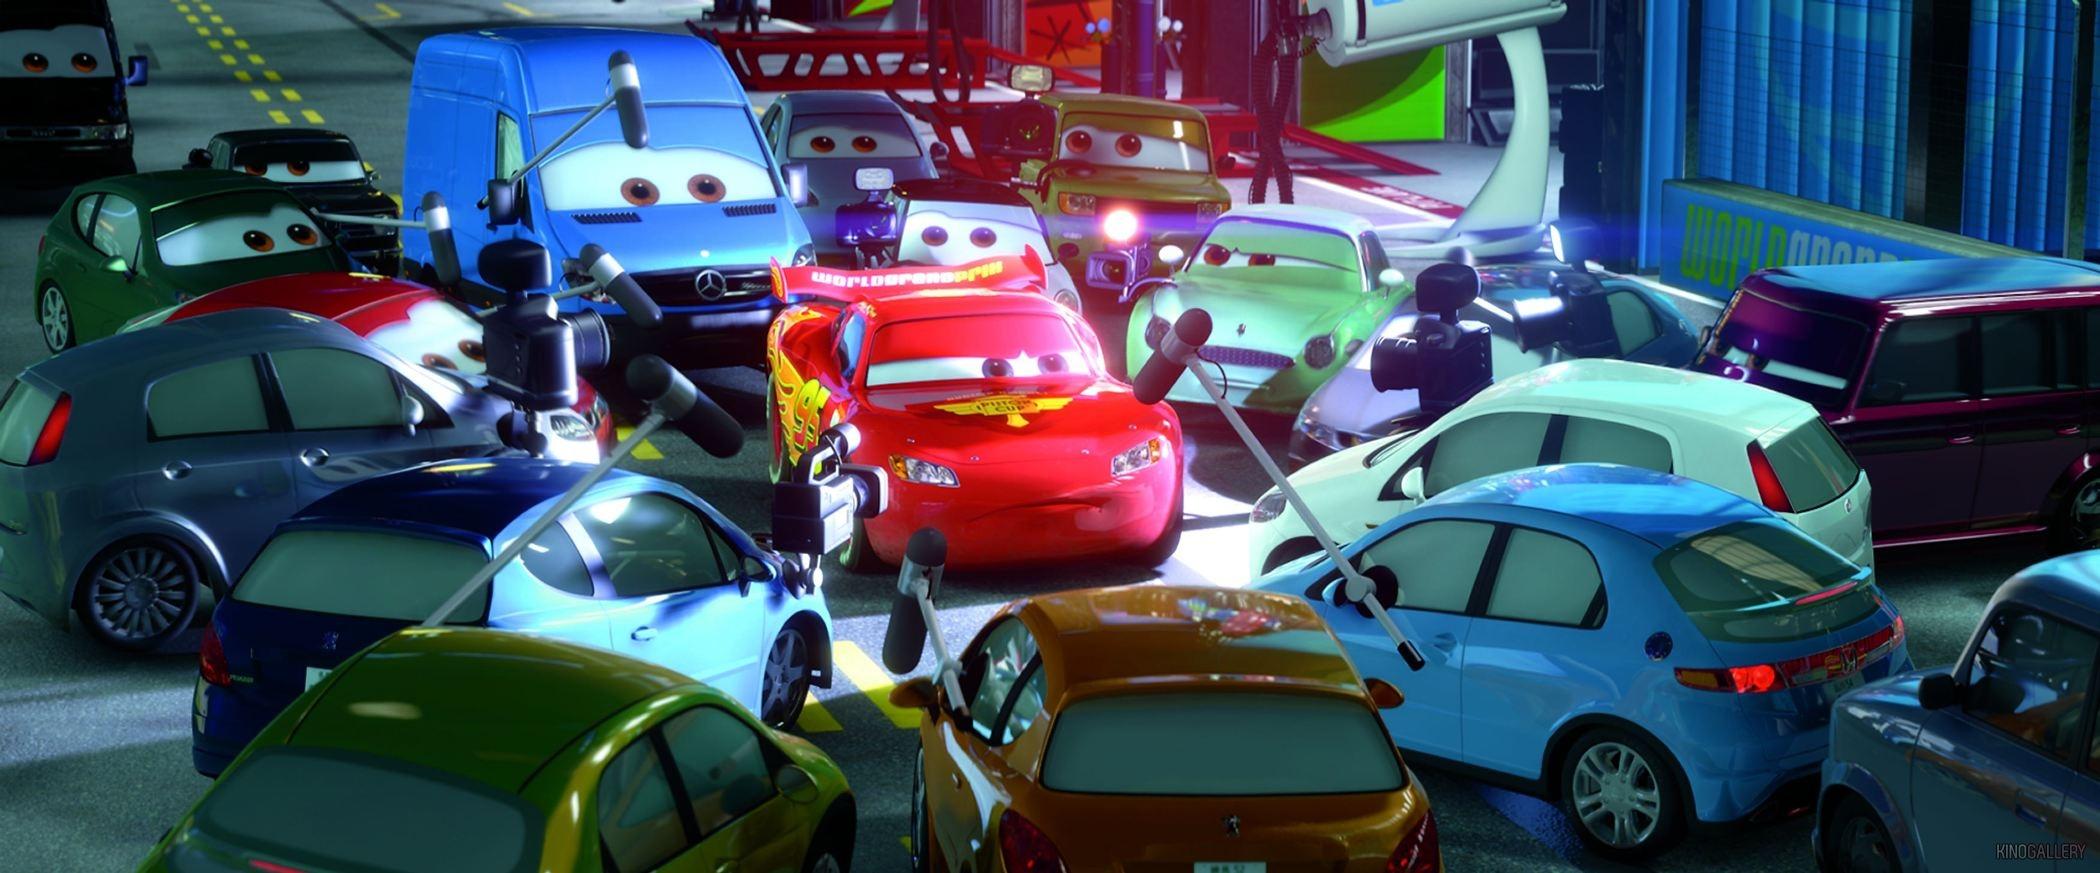 Disney Pixar Cars 2 images Cars 2 pics :) HD wallpaper and background ...